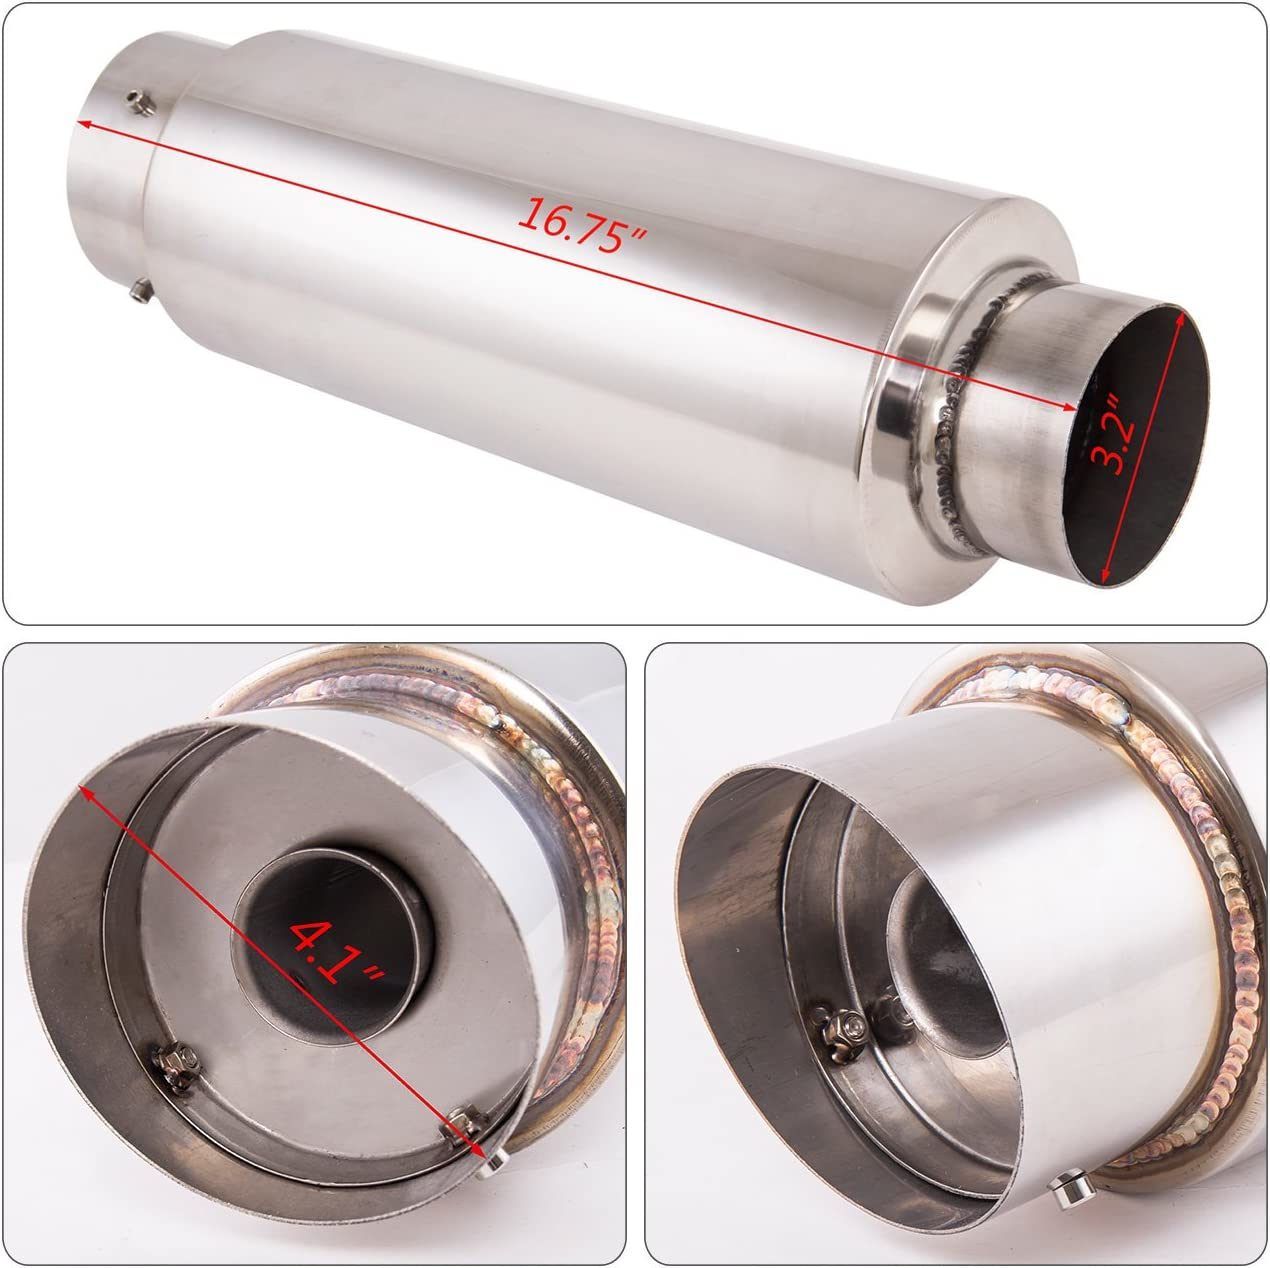 AJP Distributors Universal Fireball N1 4 4 Inch Slant Tip 3 Inlet Pipe Piping Muffler Exhaust Stainless Steel Upgrade Racing Track Drag Sport